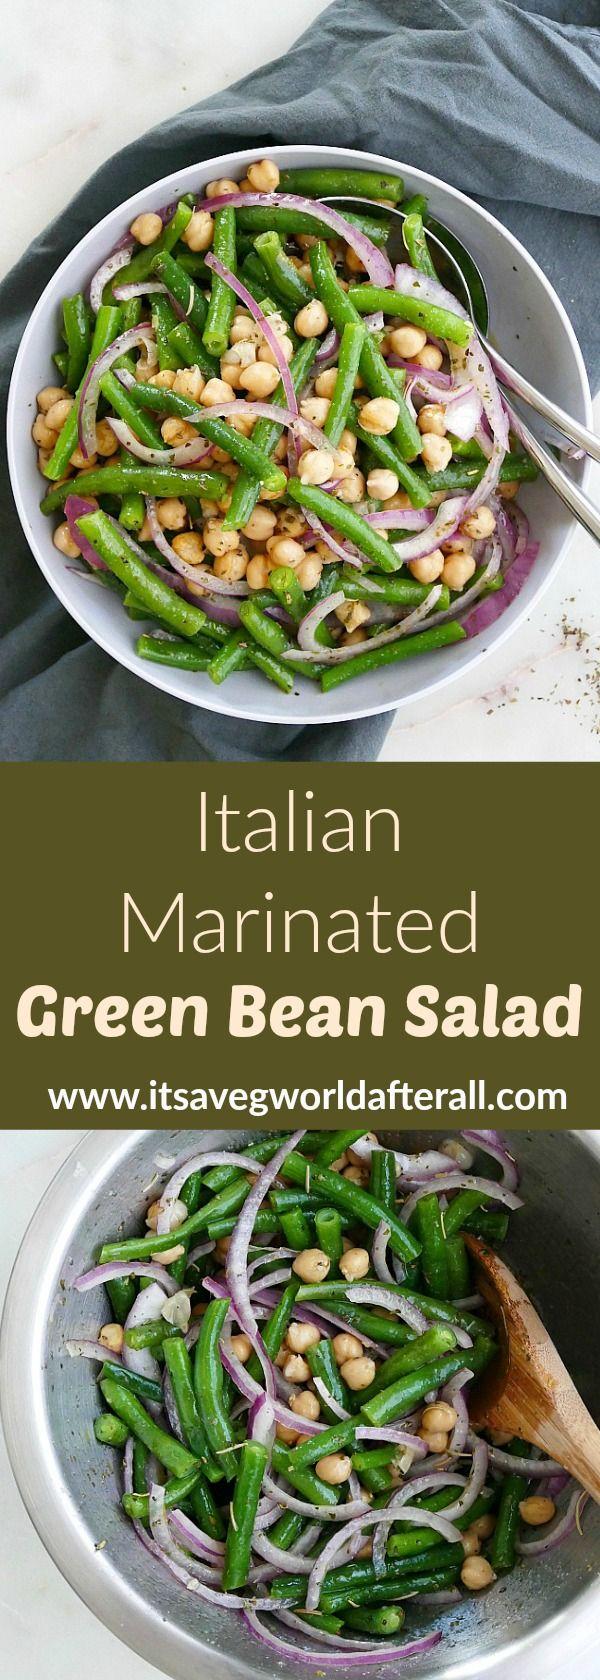 Italian Marinated Green Bean Salad #greenbean